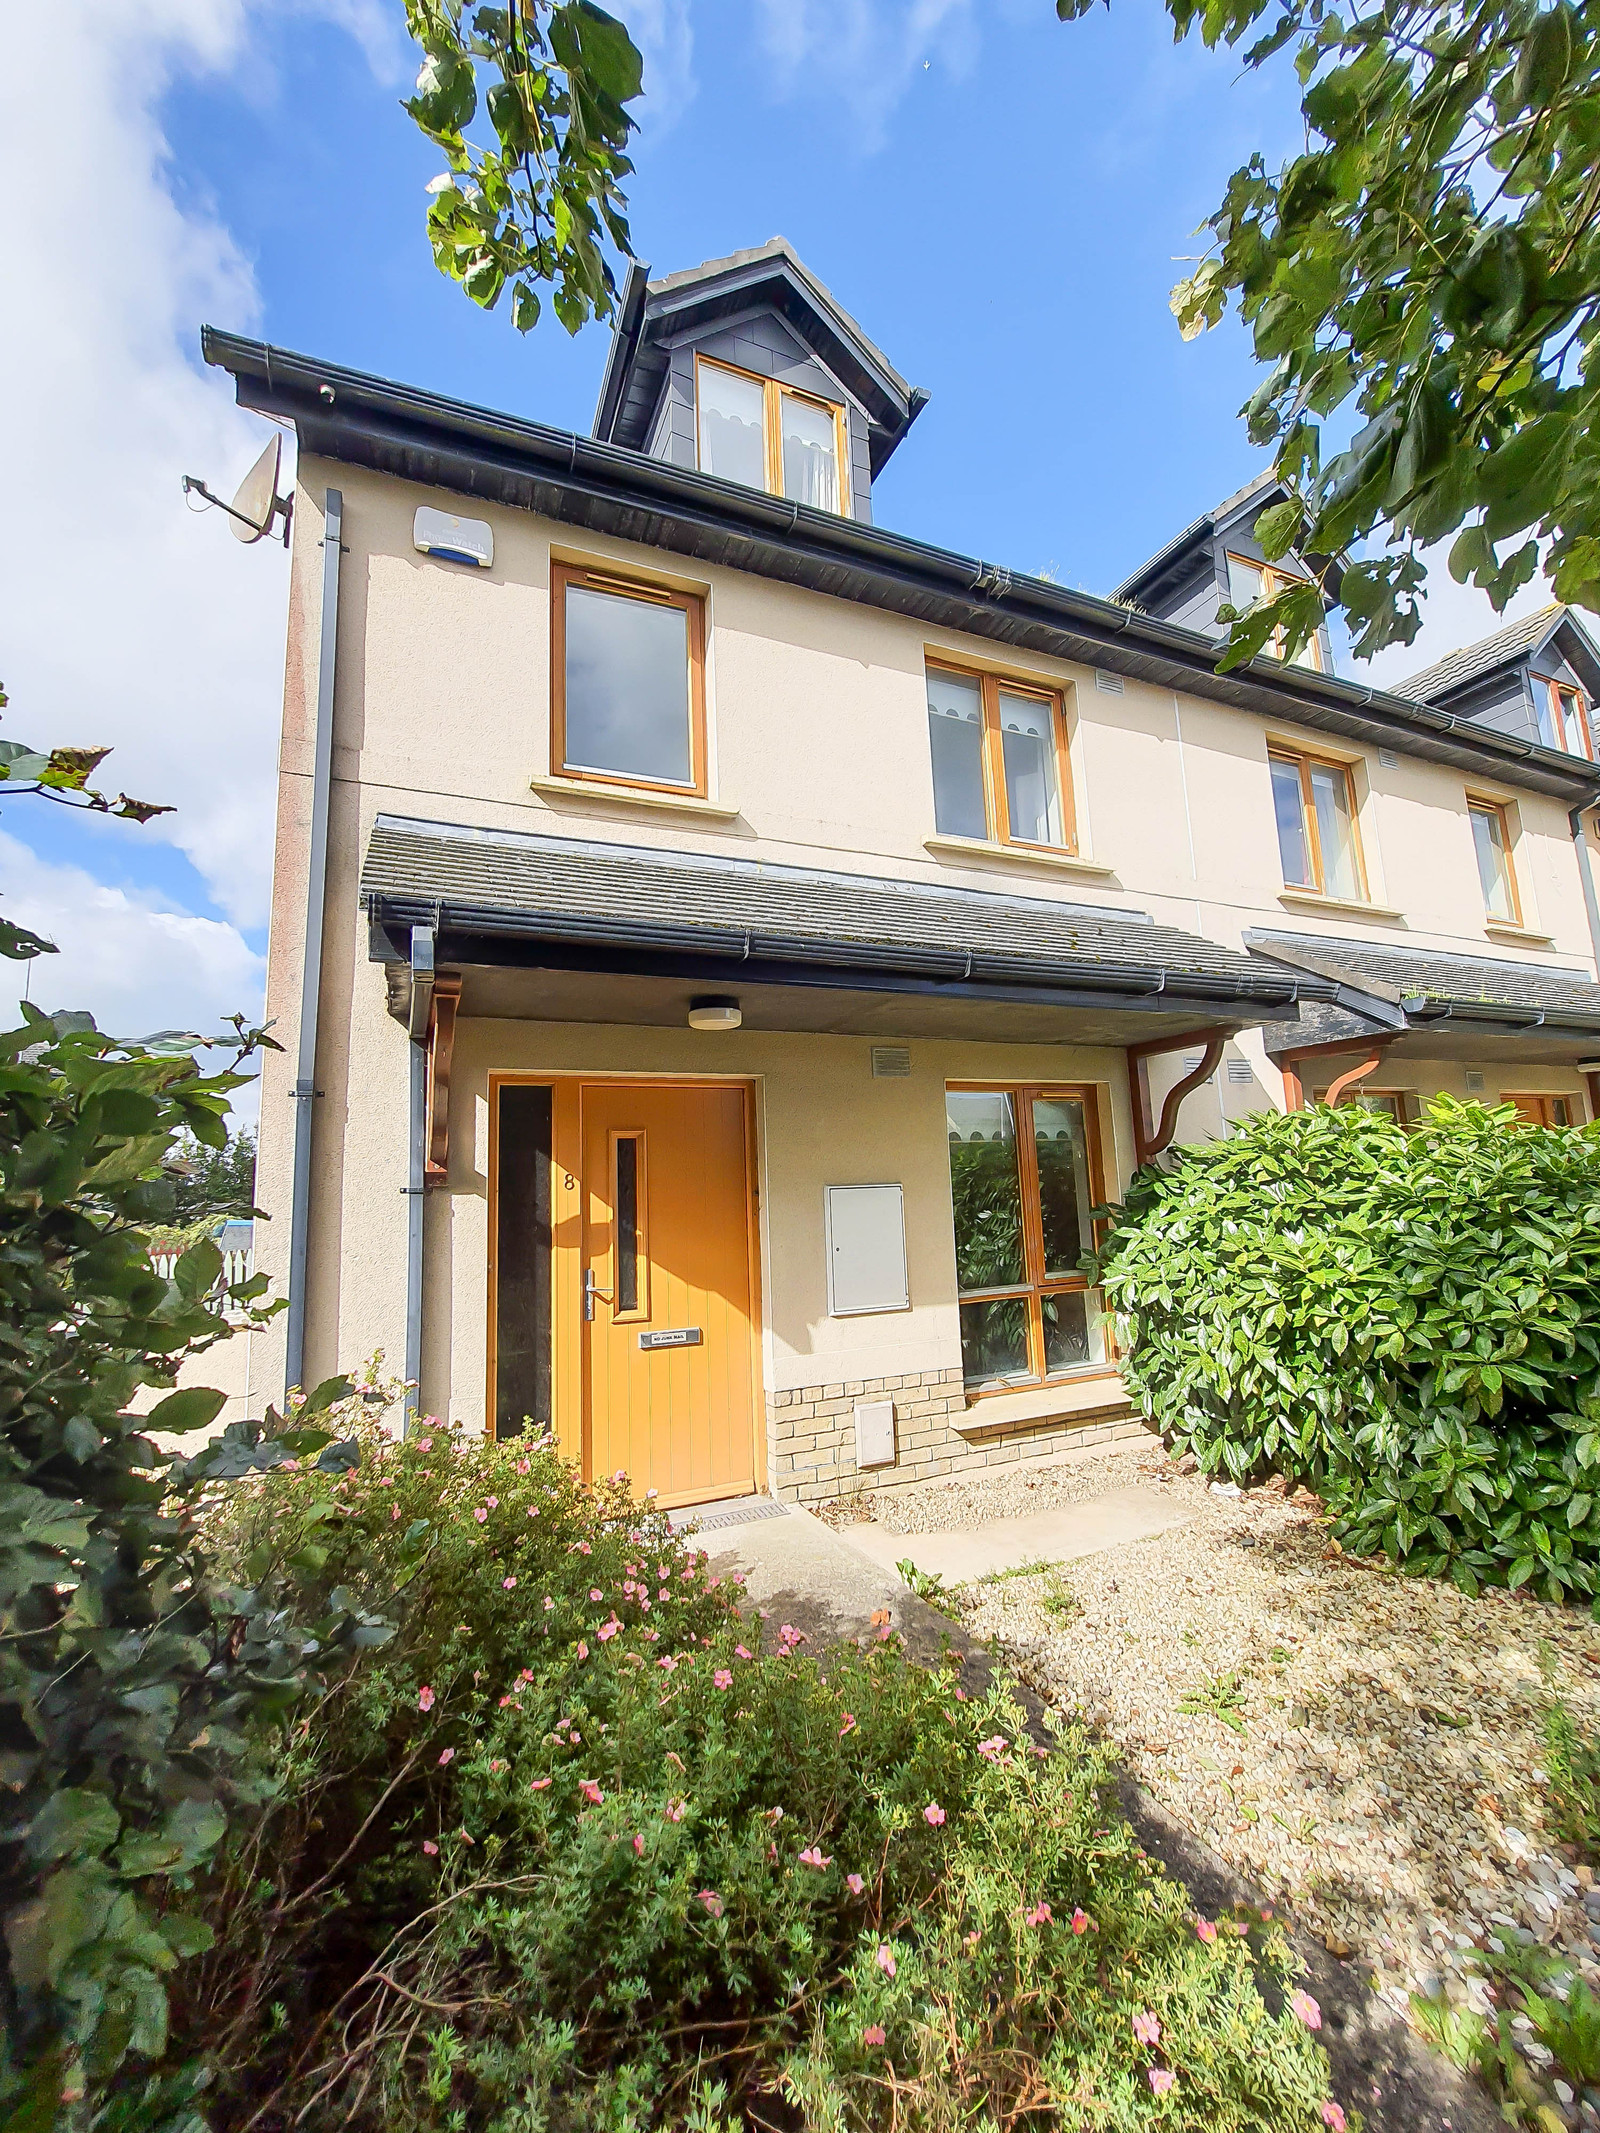 8 The Close, Clonattin Village, Gorey, Co. Wexford